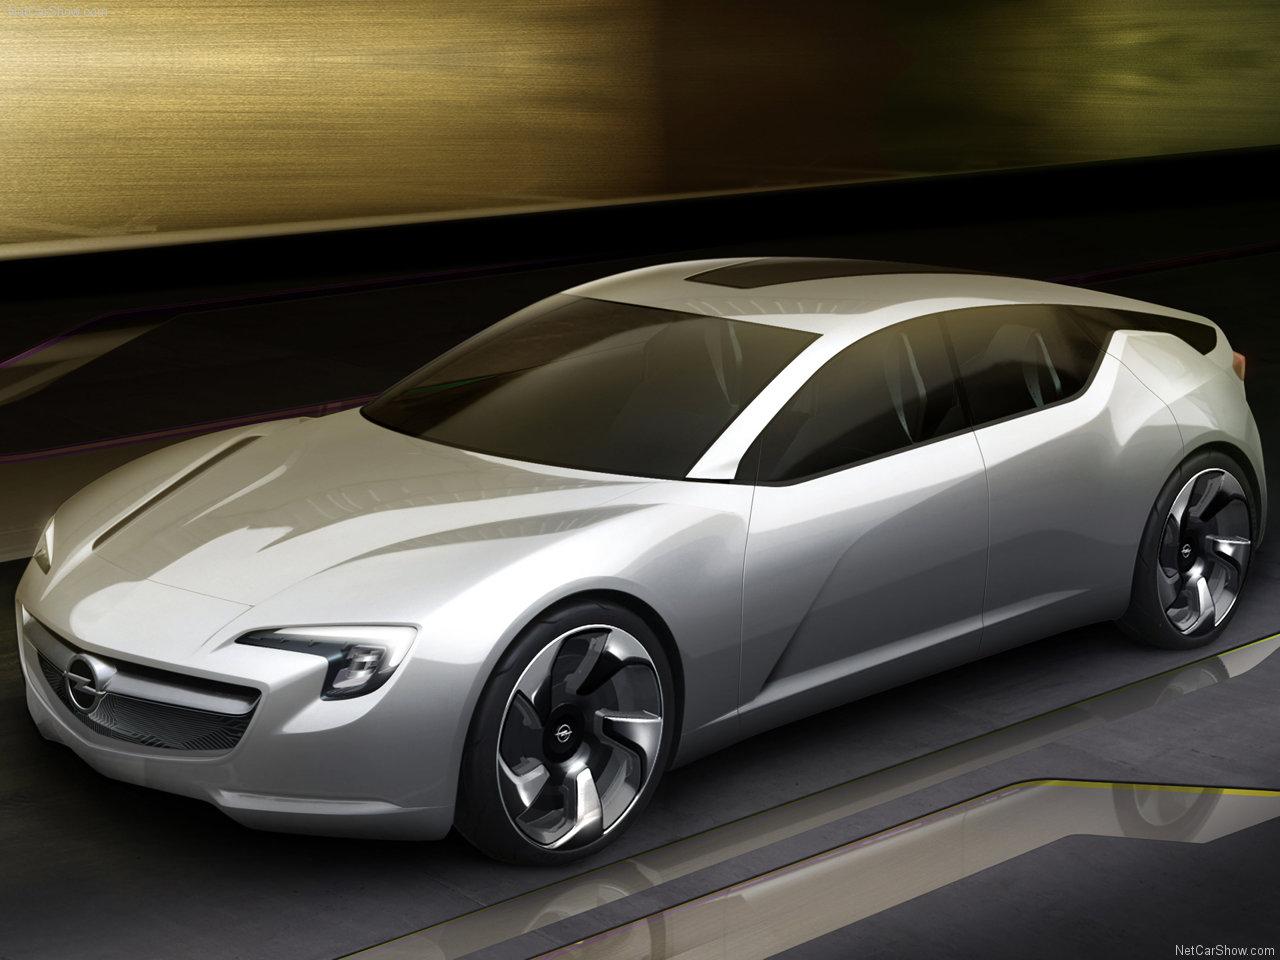 http://3.bp.blogspot.com/_lsyt_wQ2awY/TDtDl5sq0CI/AAAAAAAB-Cg/DhGQrg3w03Y/s1600/Opel-Flextreme_GT-E_Concept_2010_1280x960_wallpaper_01.jpg